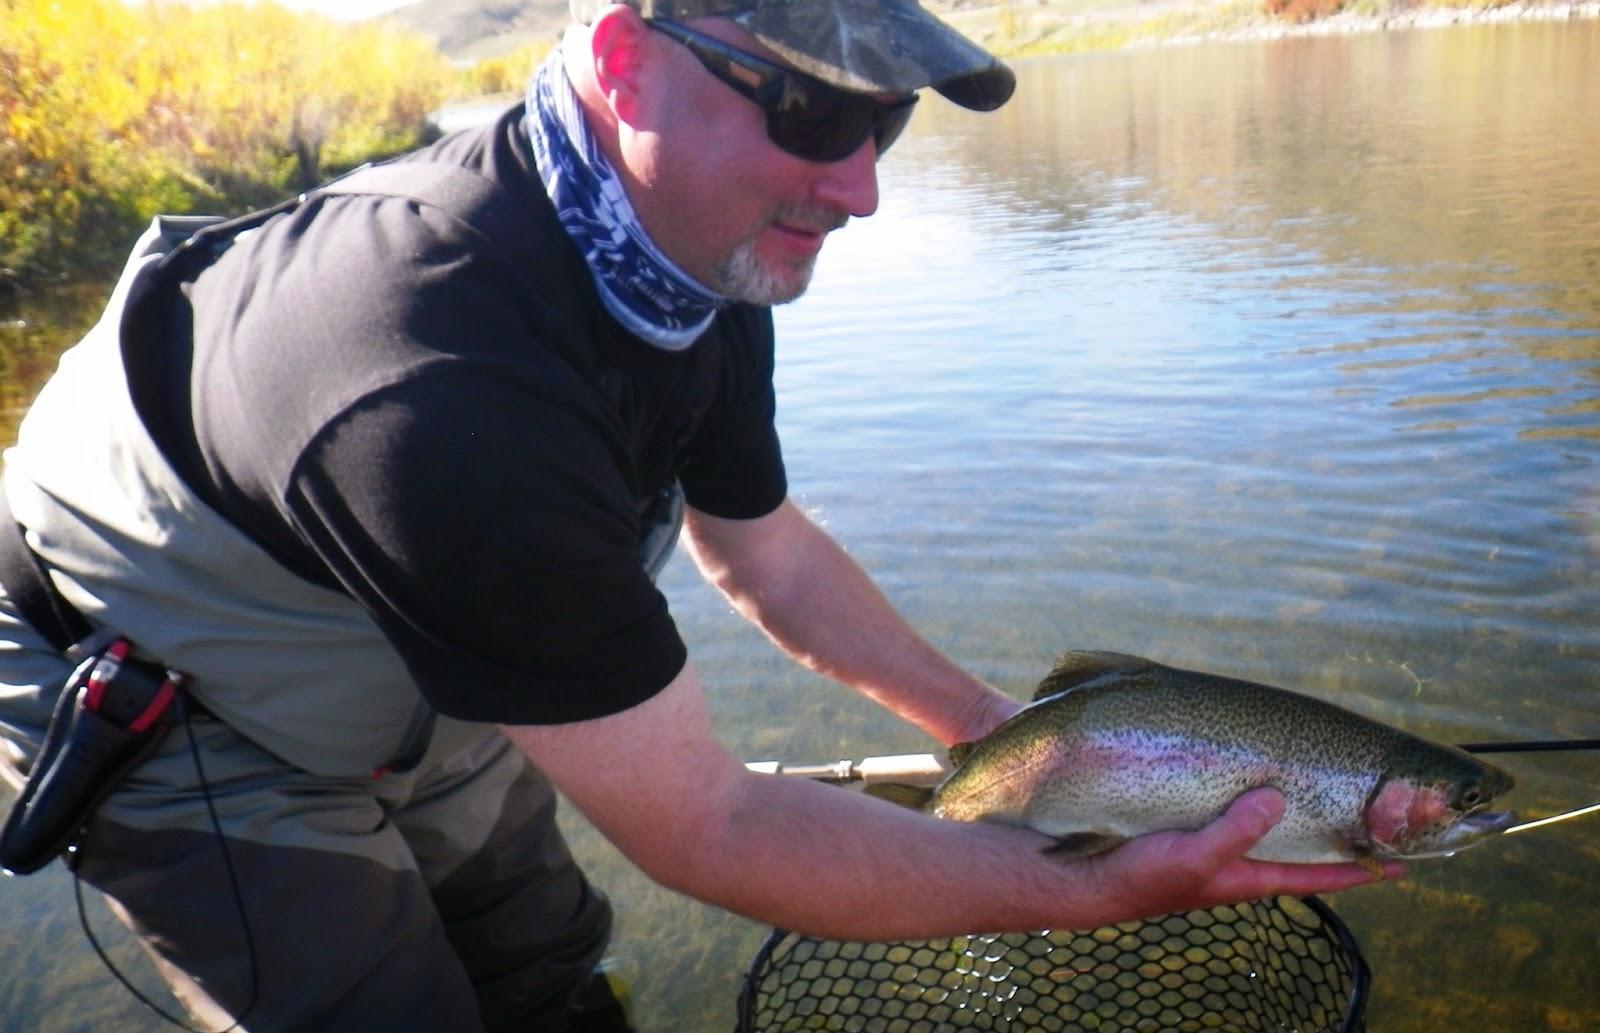 Montana: Missouri River - Fly Fishing with MicroSpey - Greg Darling